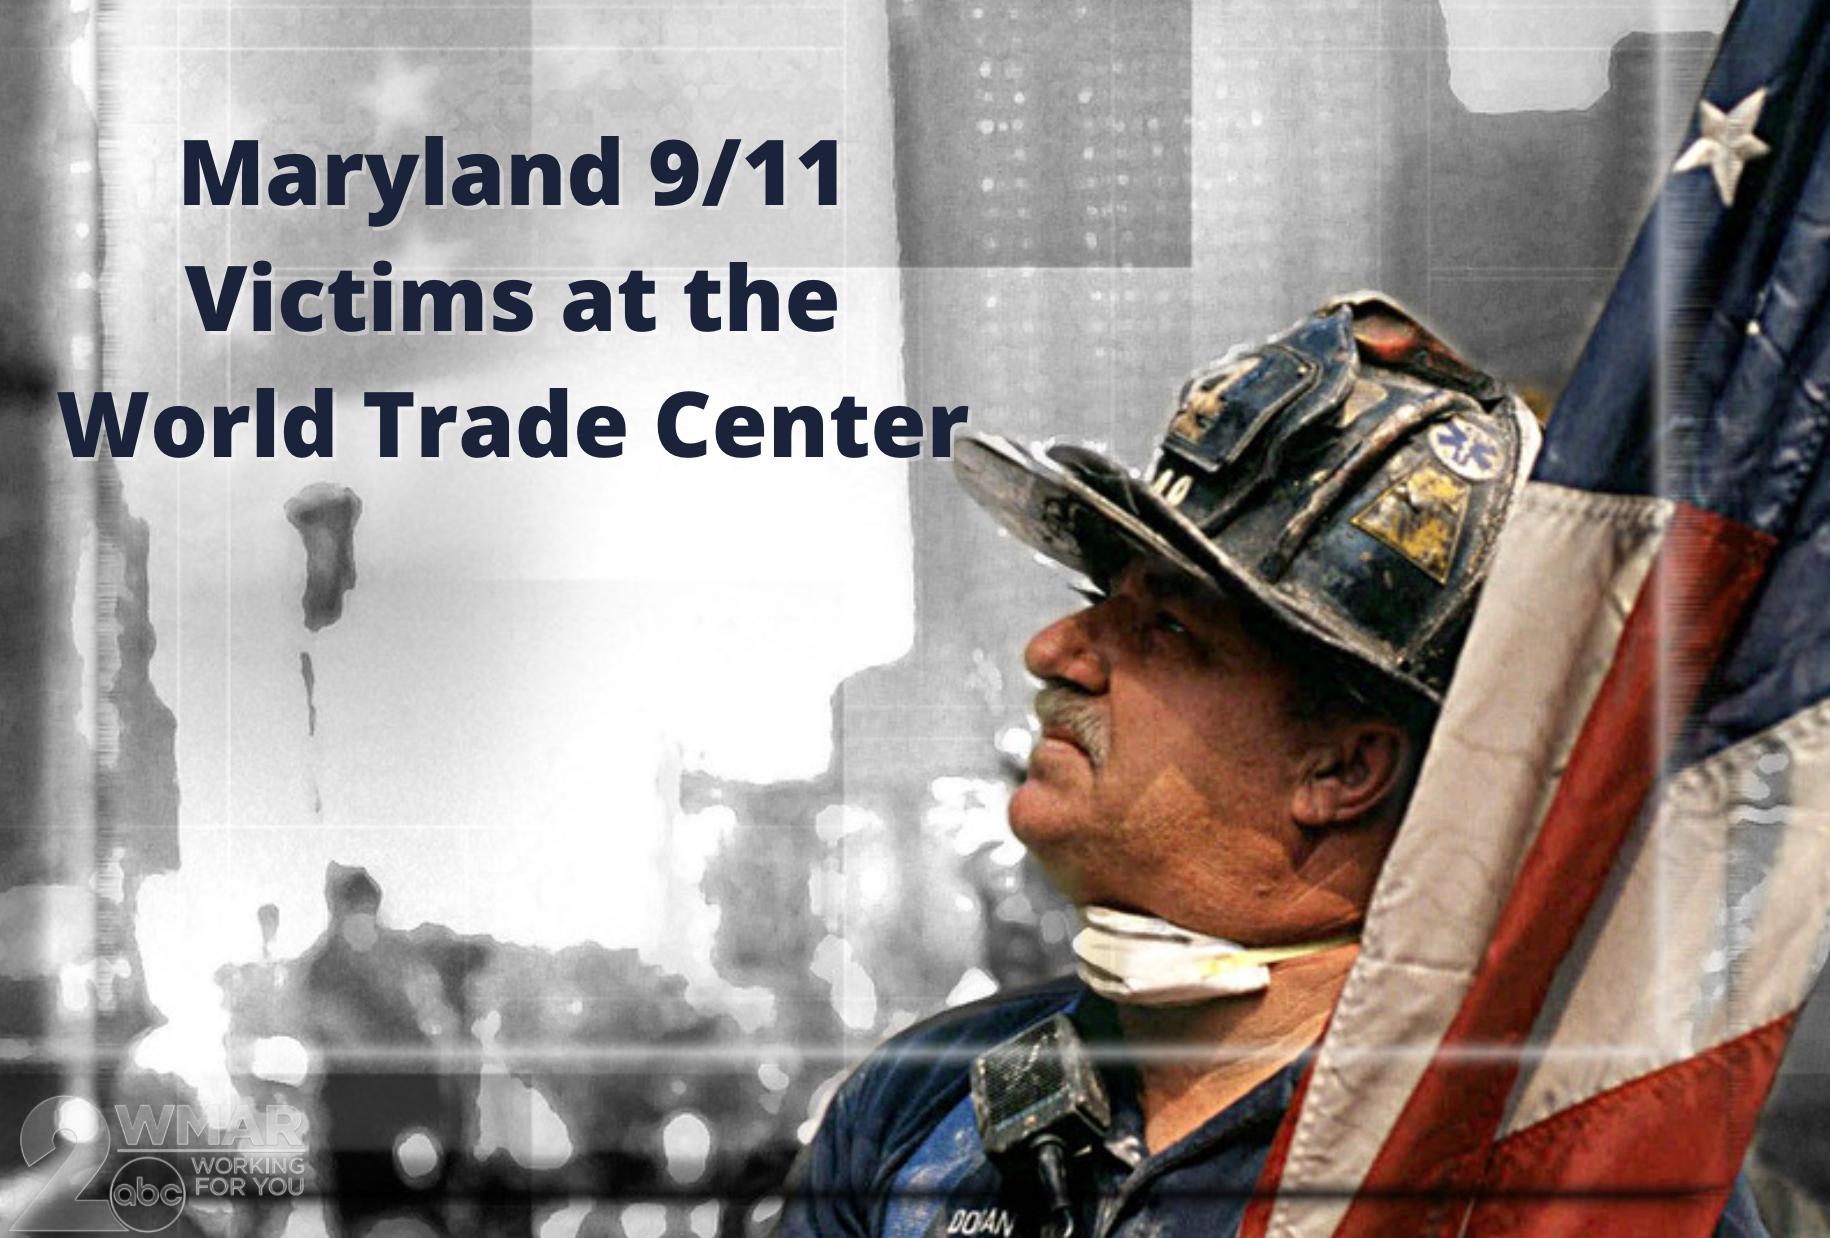 world trade center victims 9/11